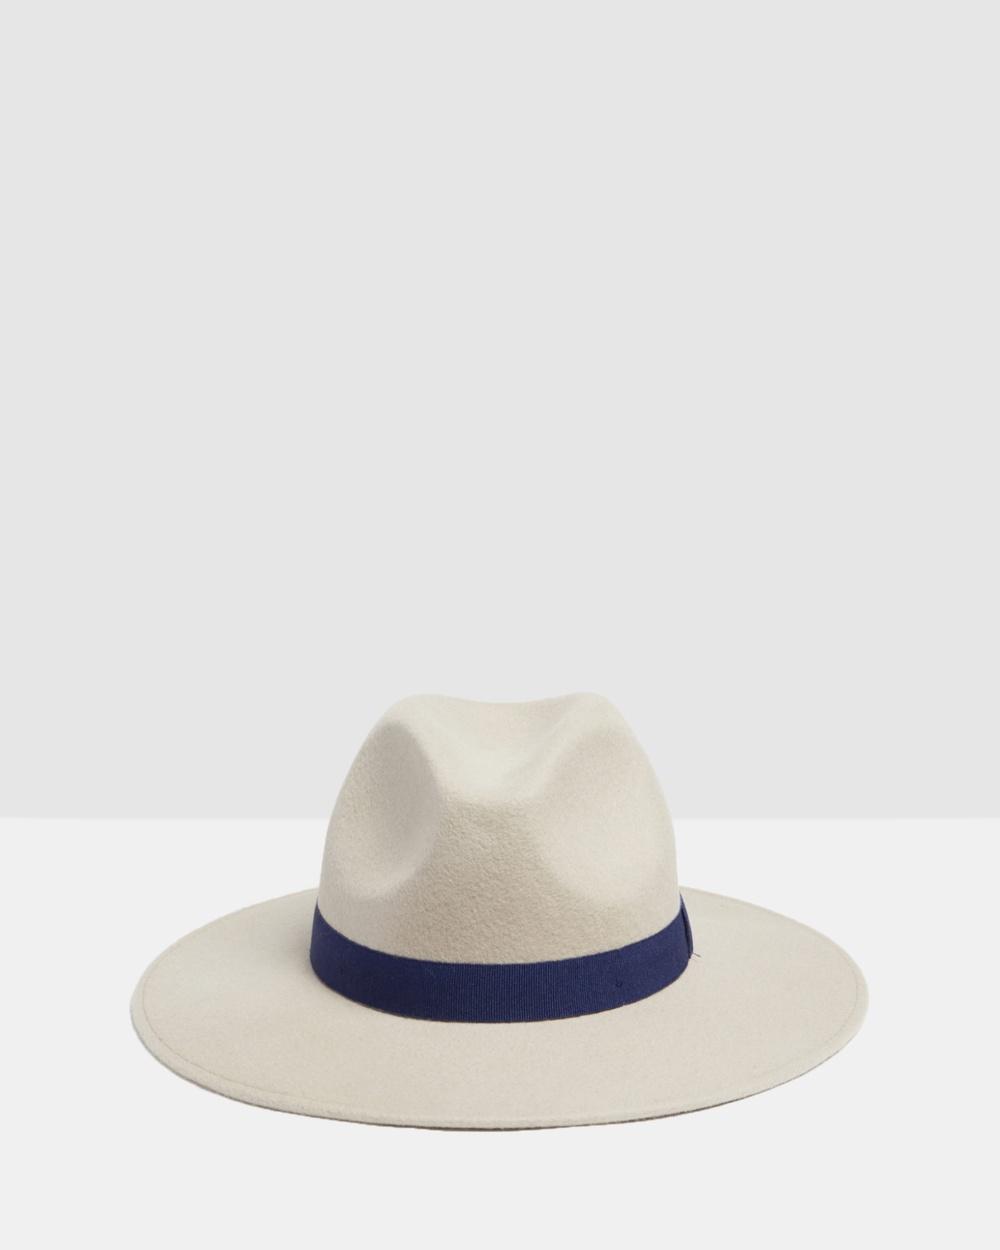 Kate & Confusion Colorado Fedora Hats Taupe